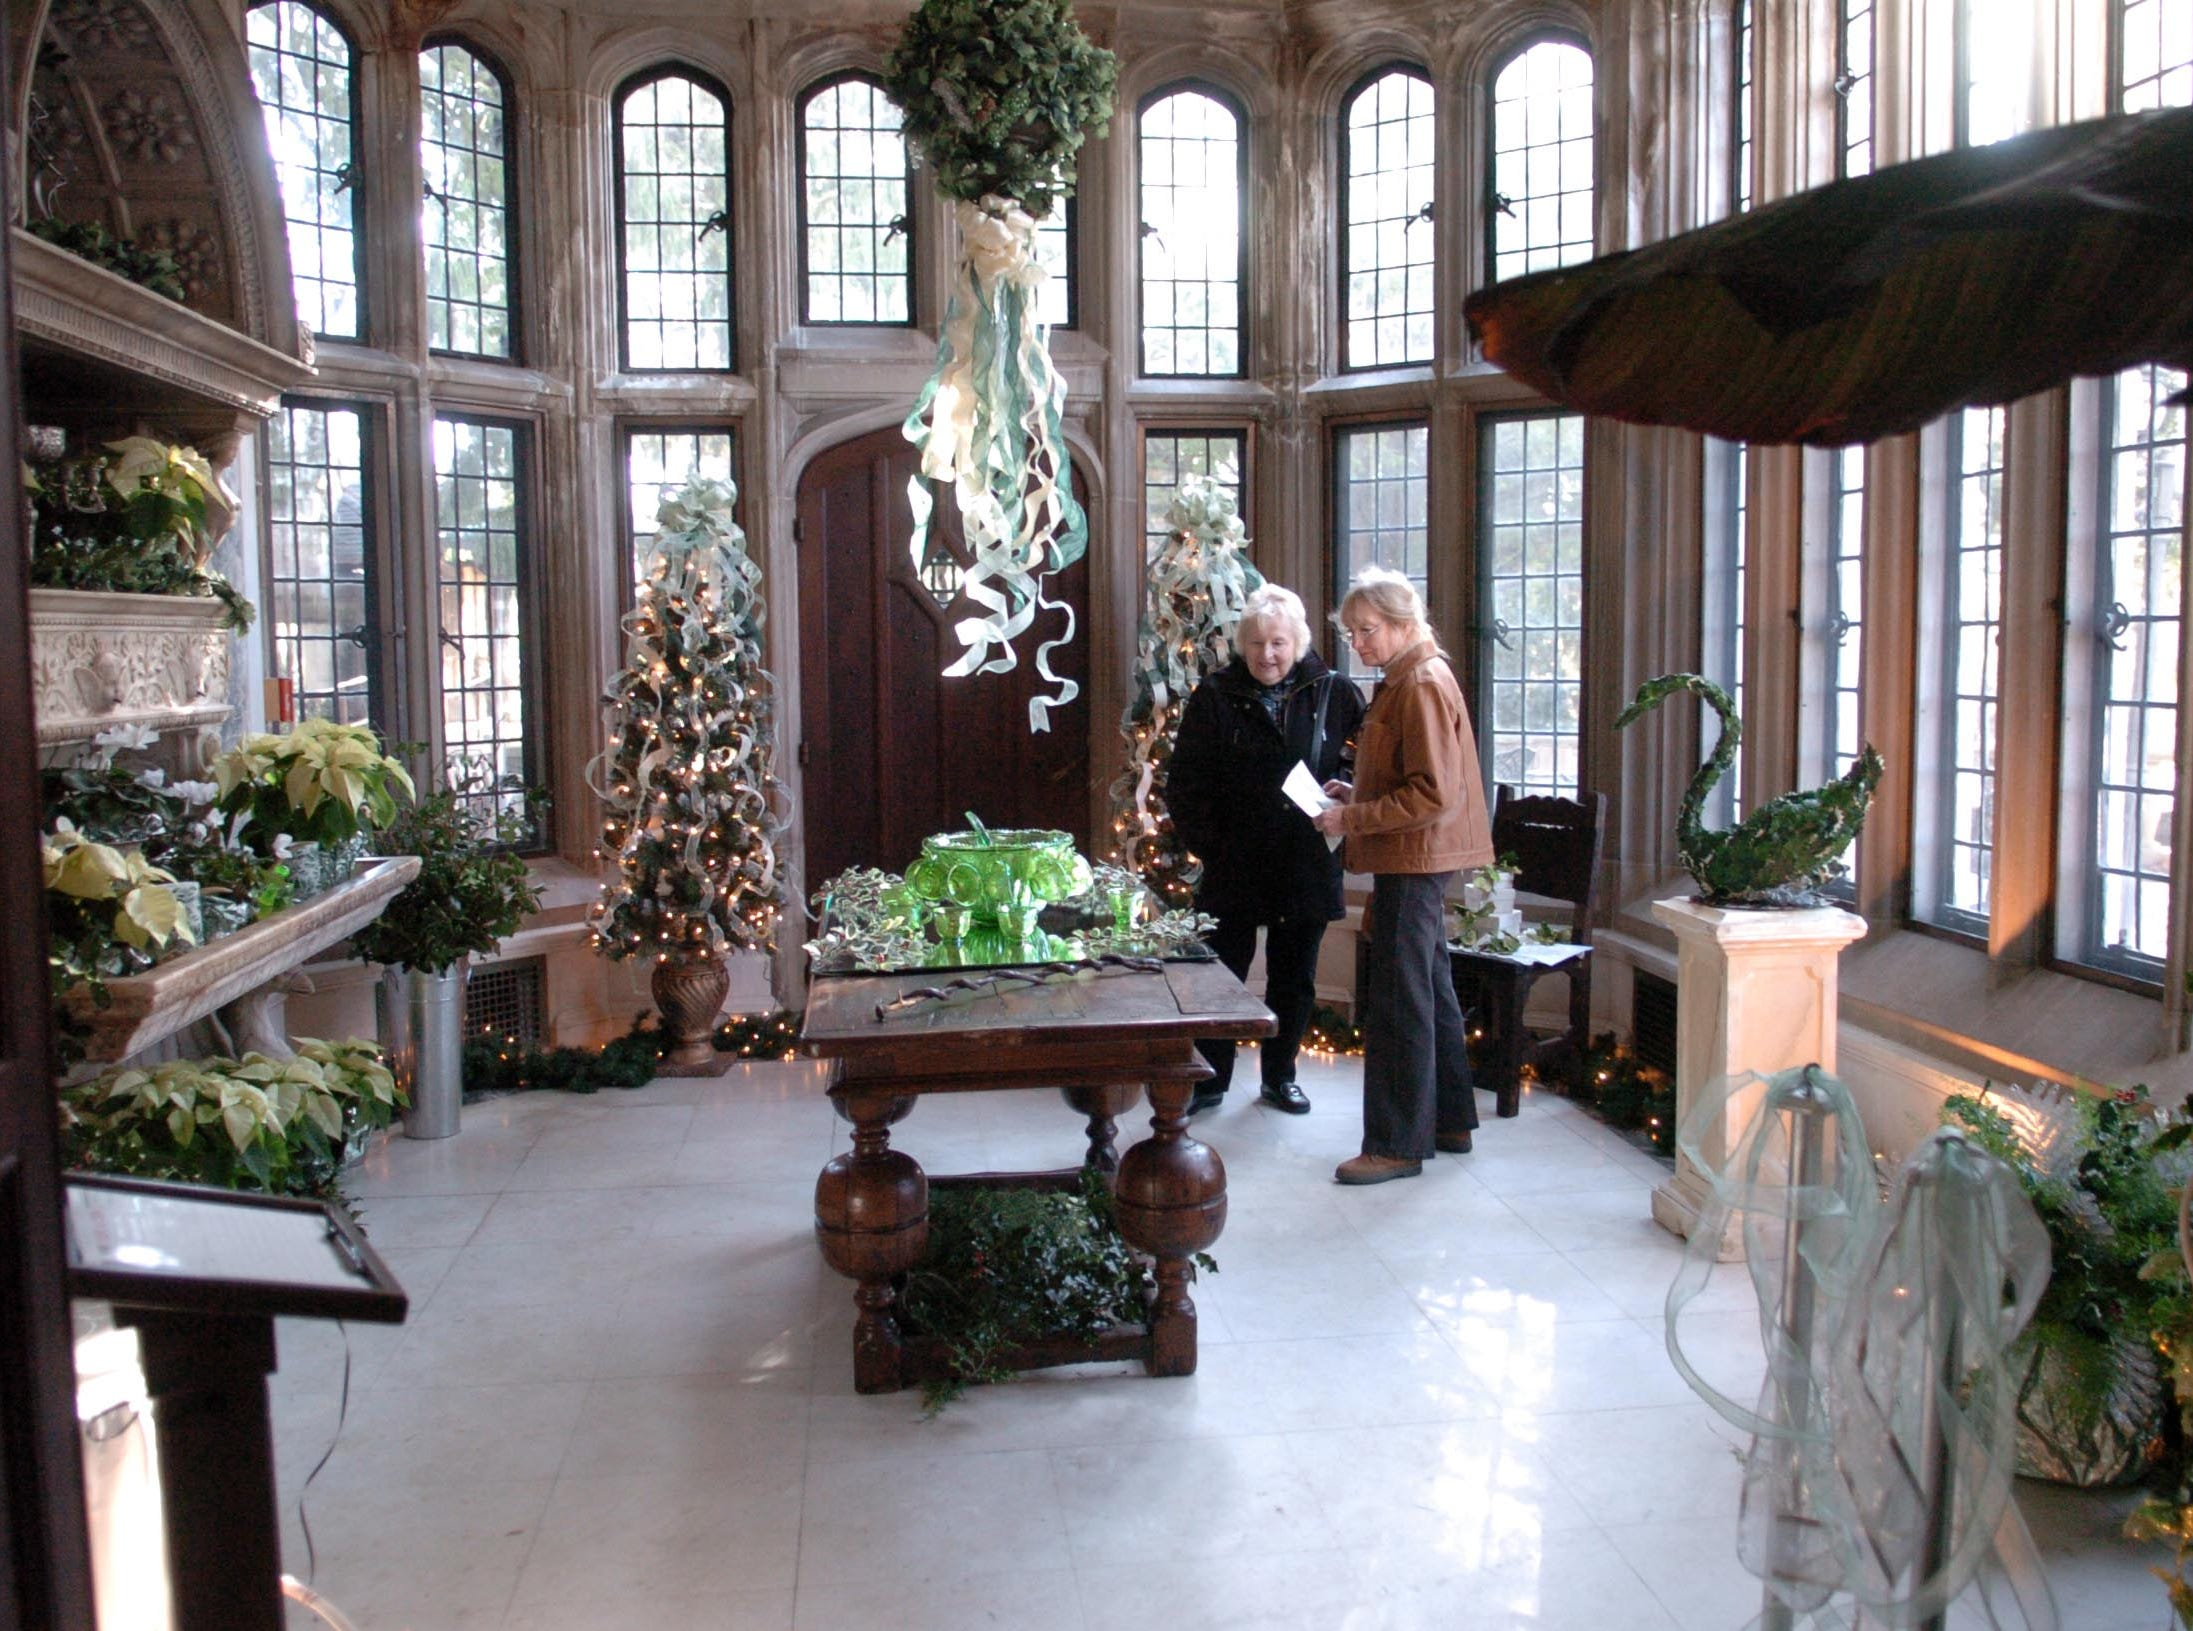 Judith Bott and Ellen Brooks admire a room at Skylands Manor during a Skylands Association holiday open house on Dec. 1, 2011.